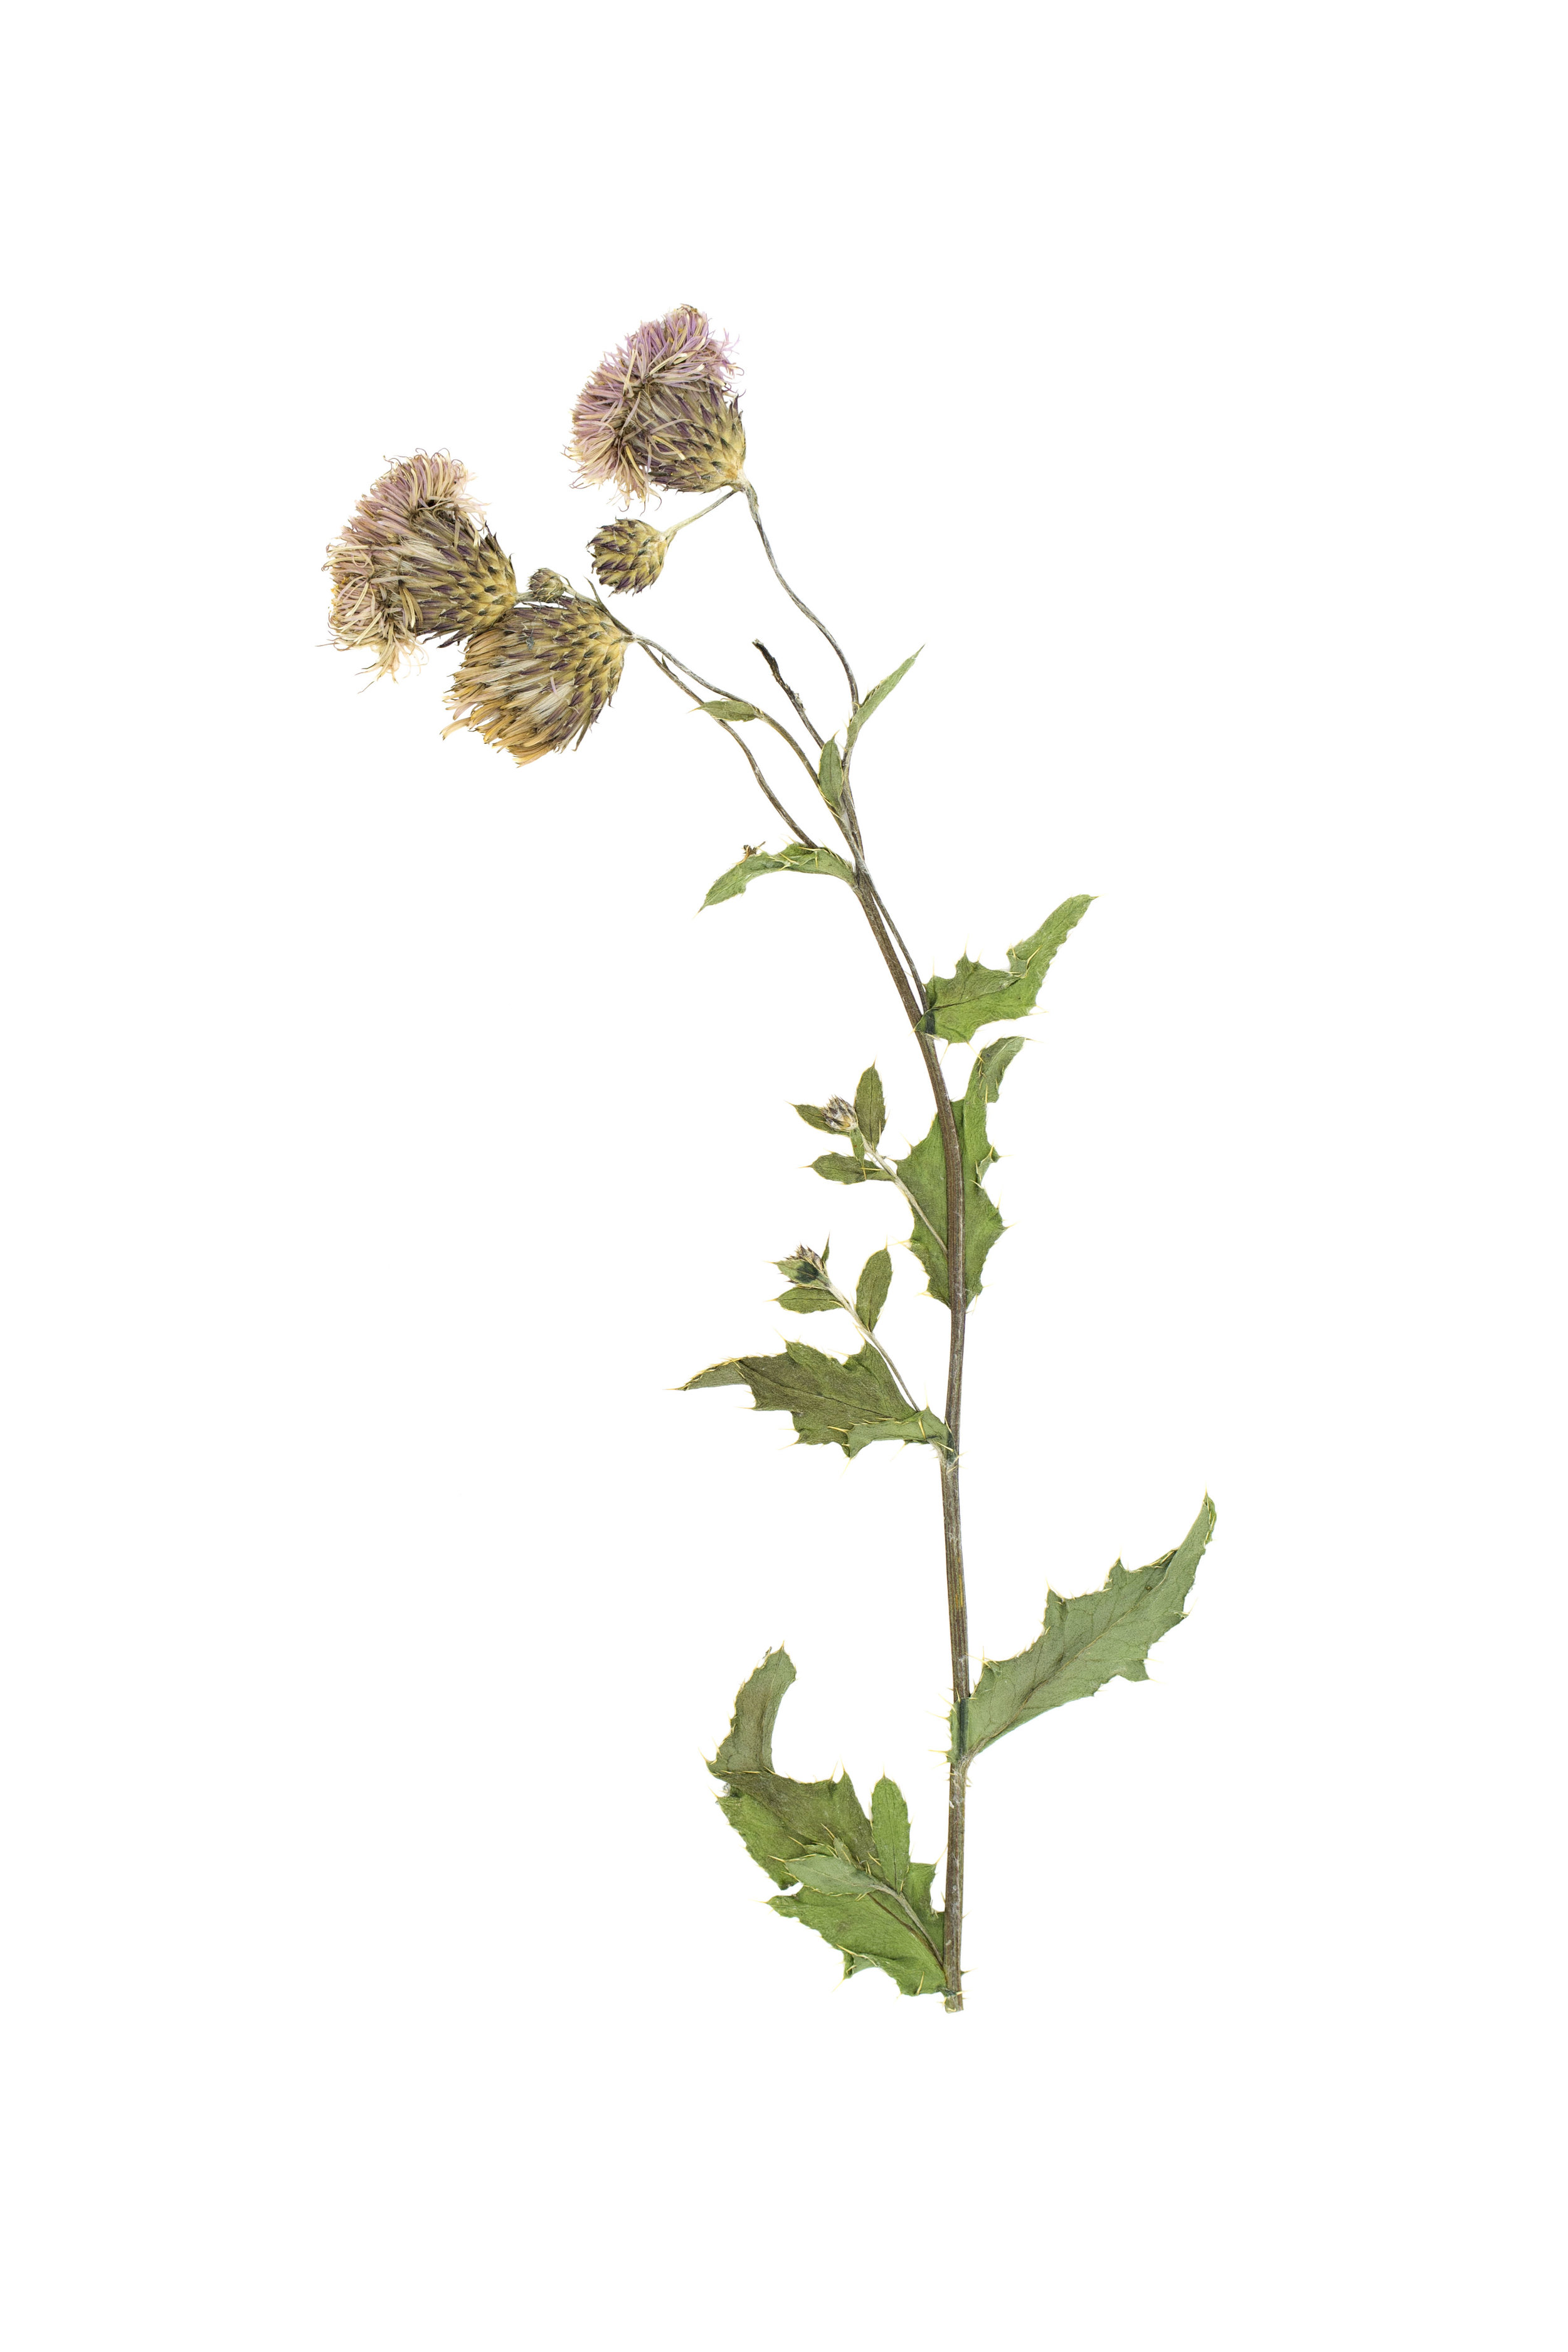 New! Creeping Thistle / Cirsium arvense